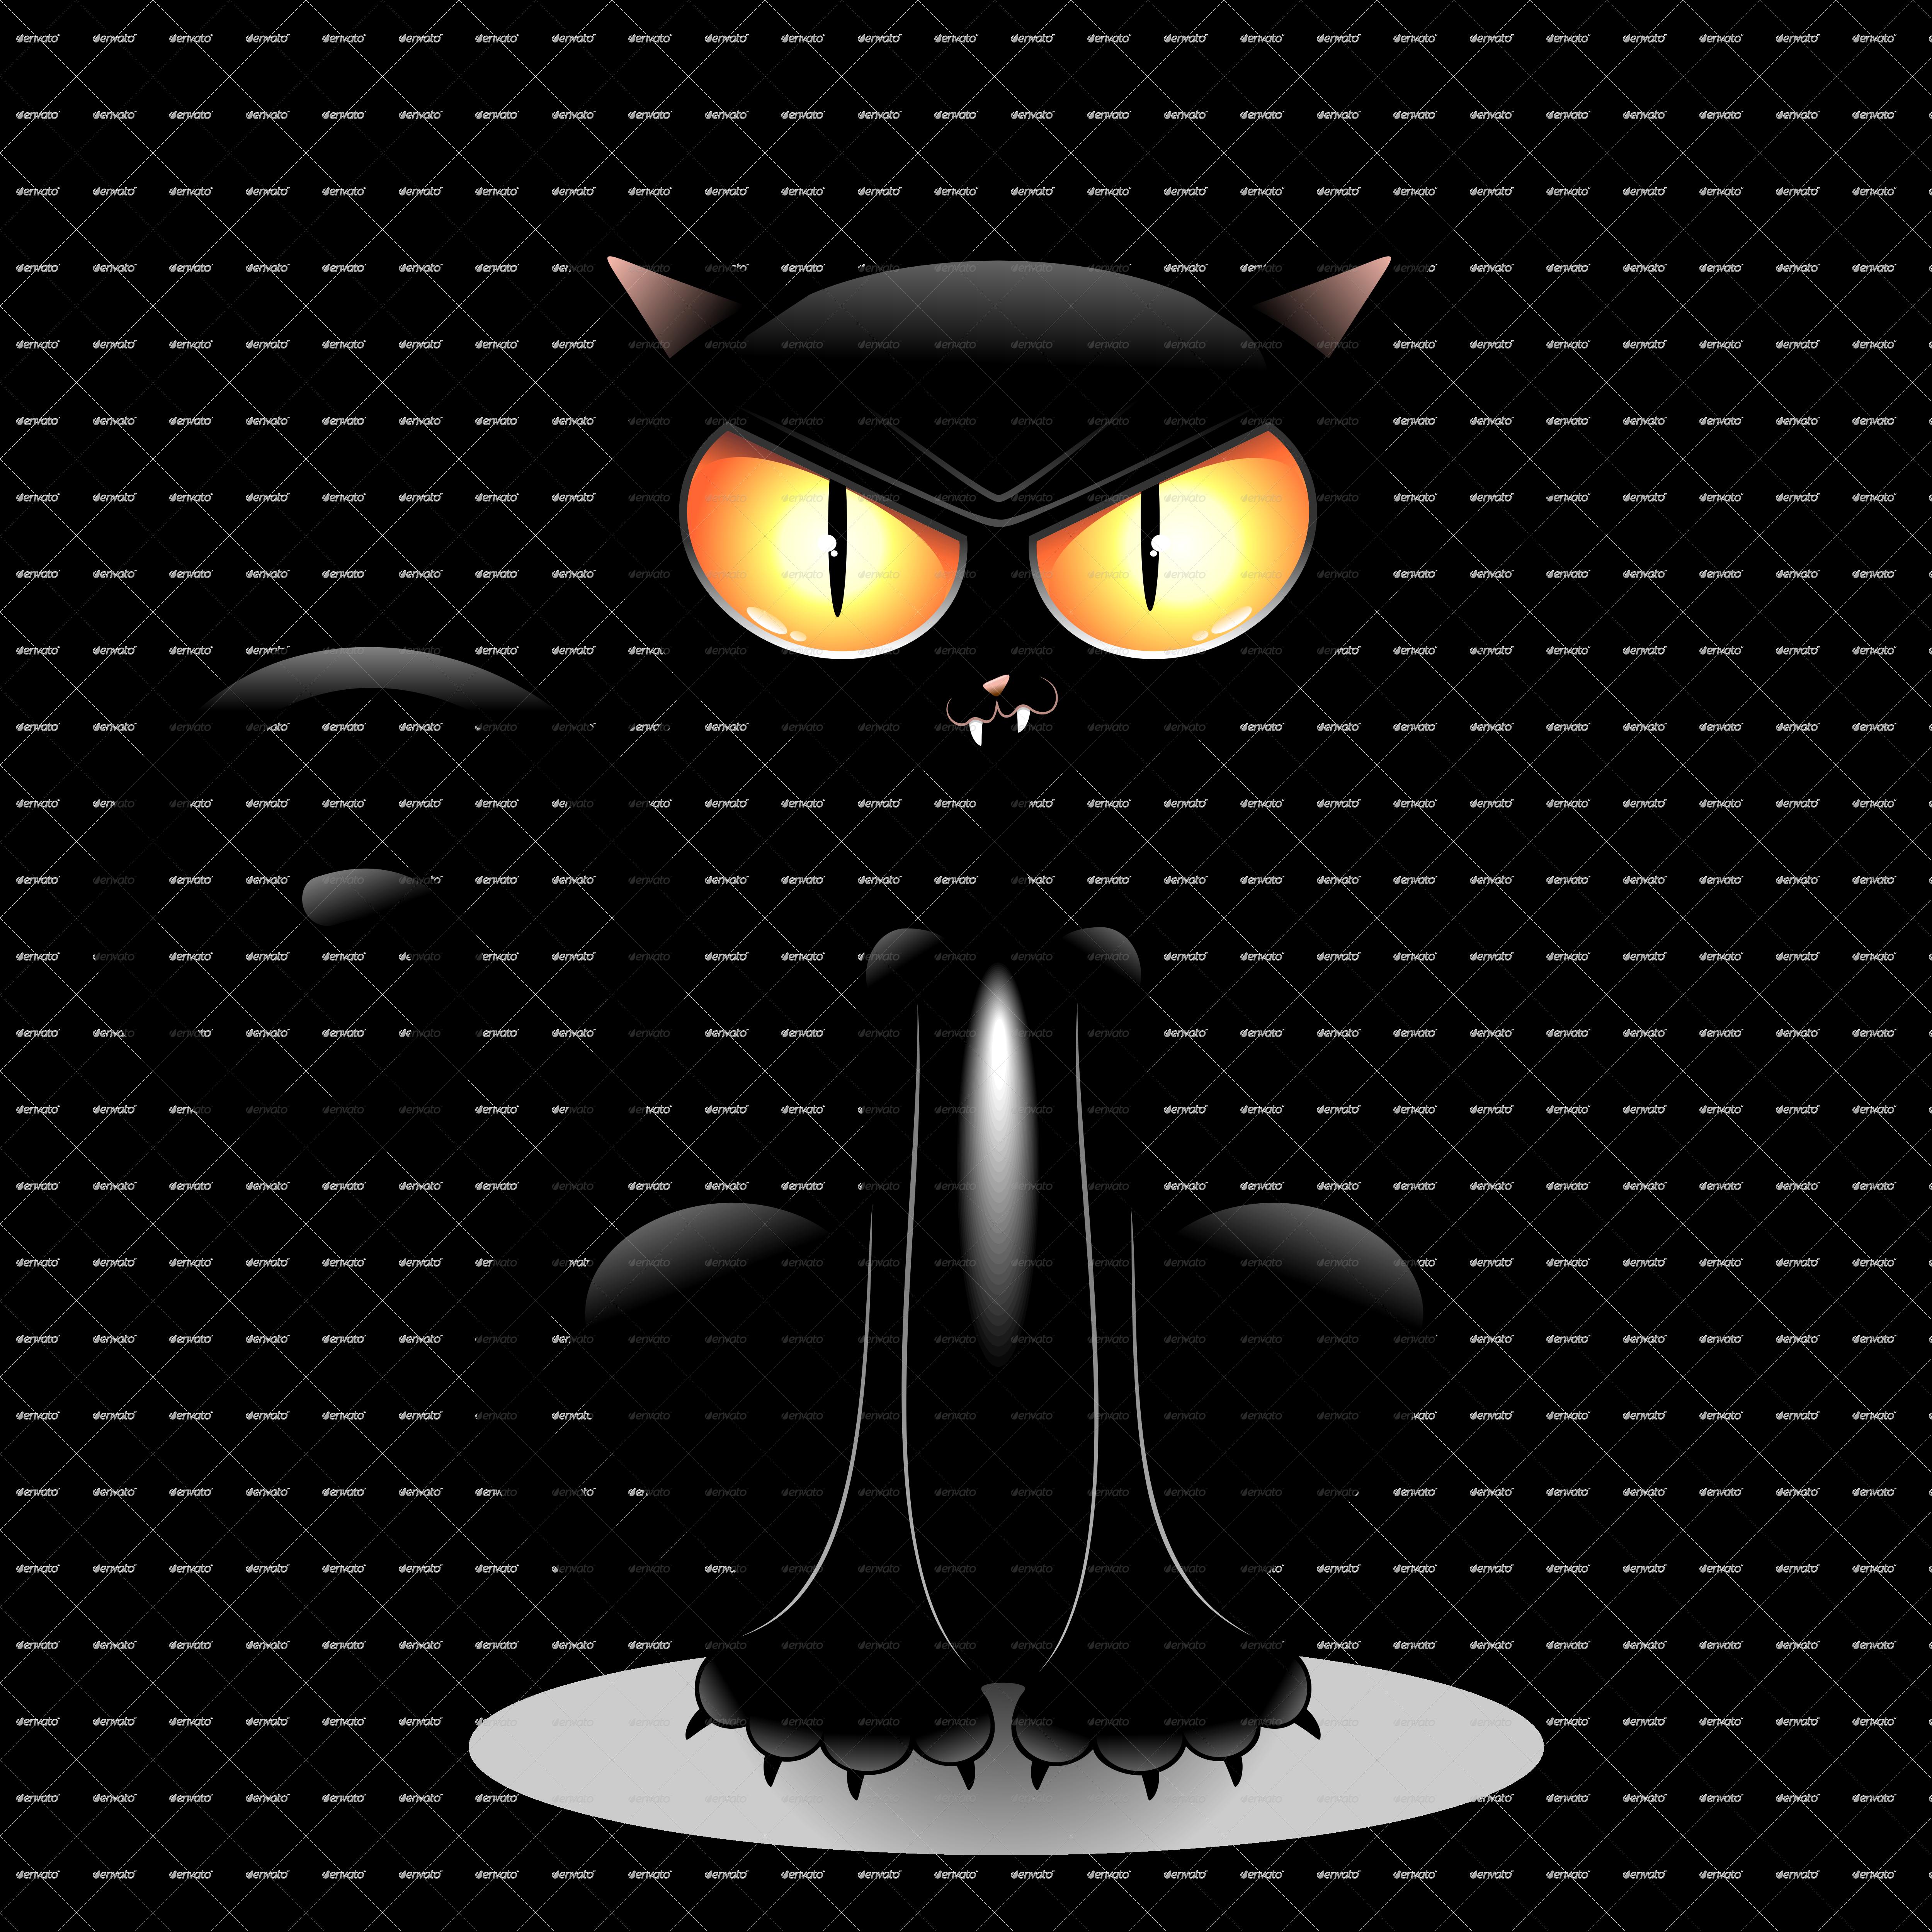 Evil black cat clipart picture black and white download Cartoon Black Cat (30+) Desktop Backgrounds picture black and white download